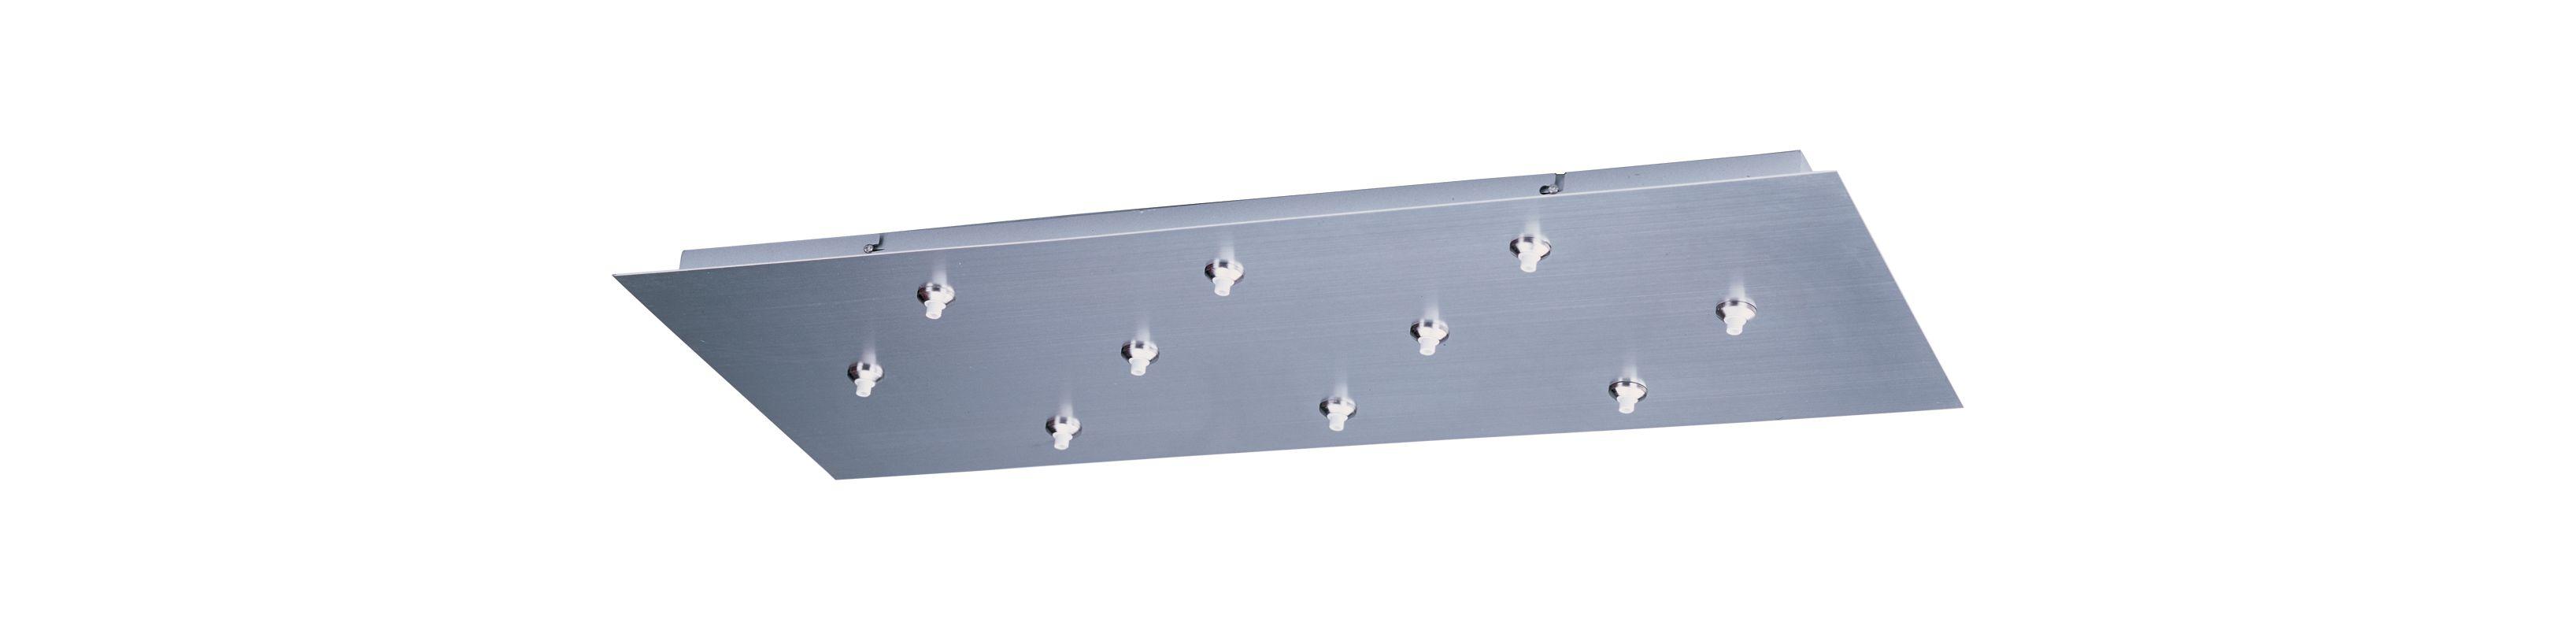 ET2 EC95025 RapidJack 10 Light Canopy Satin Nickel Accessory Canopies